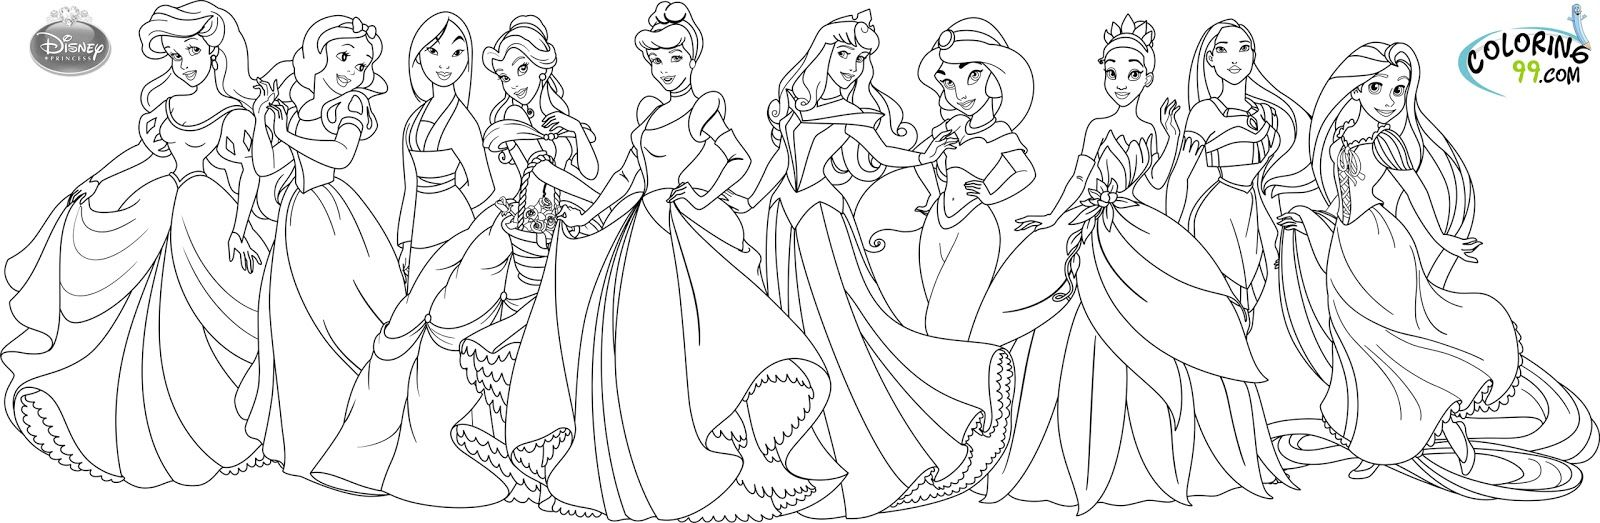 Princesses Disney Princess Coloring Pages Disney Princess Colors Princess Coloring